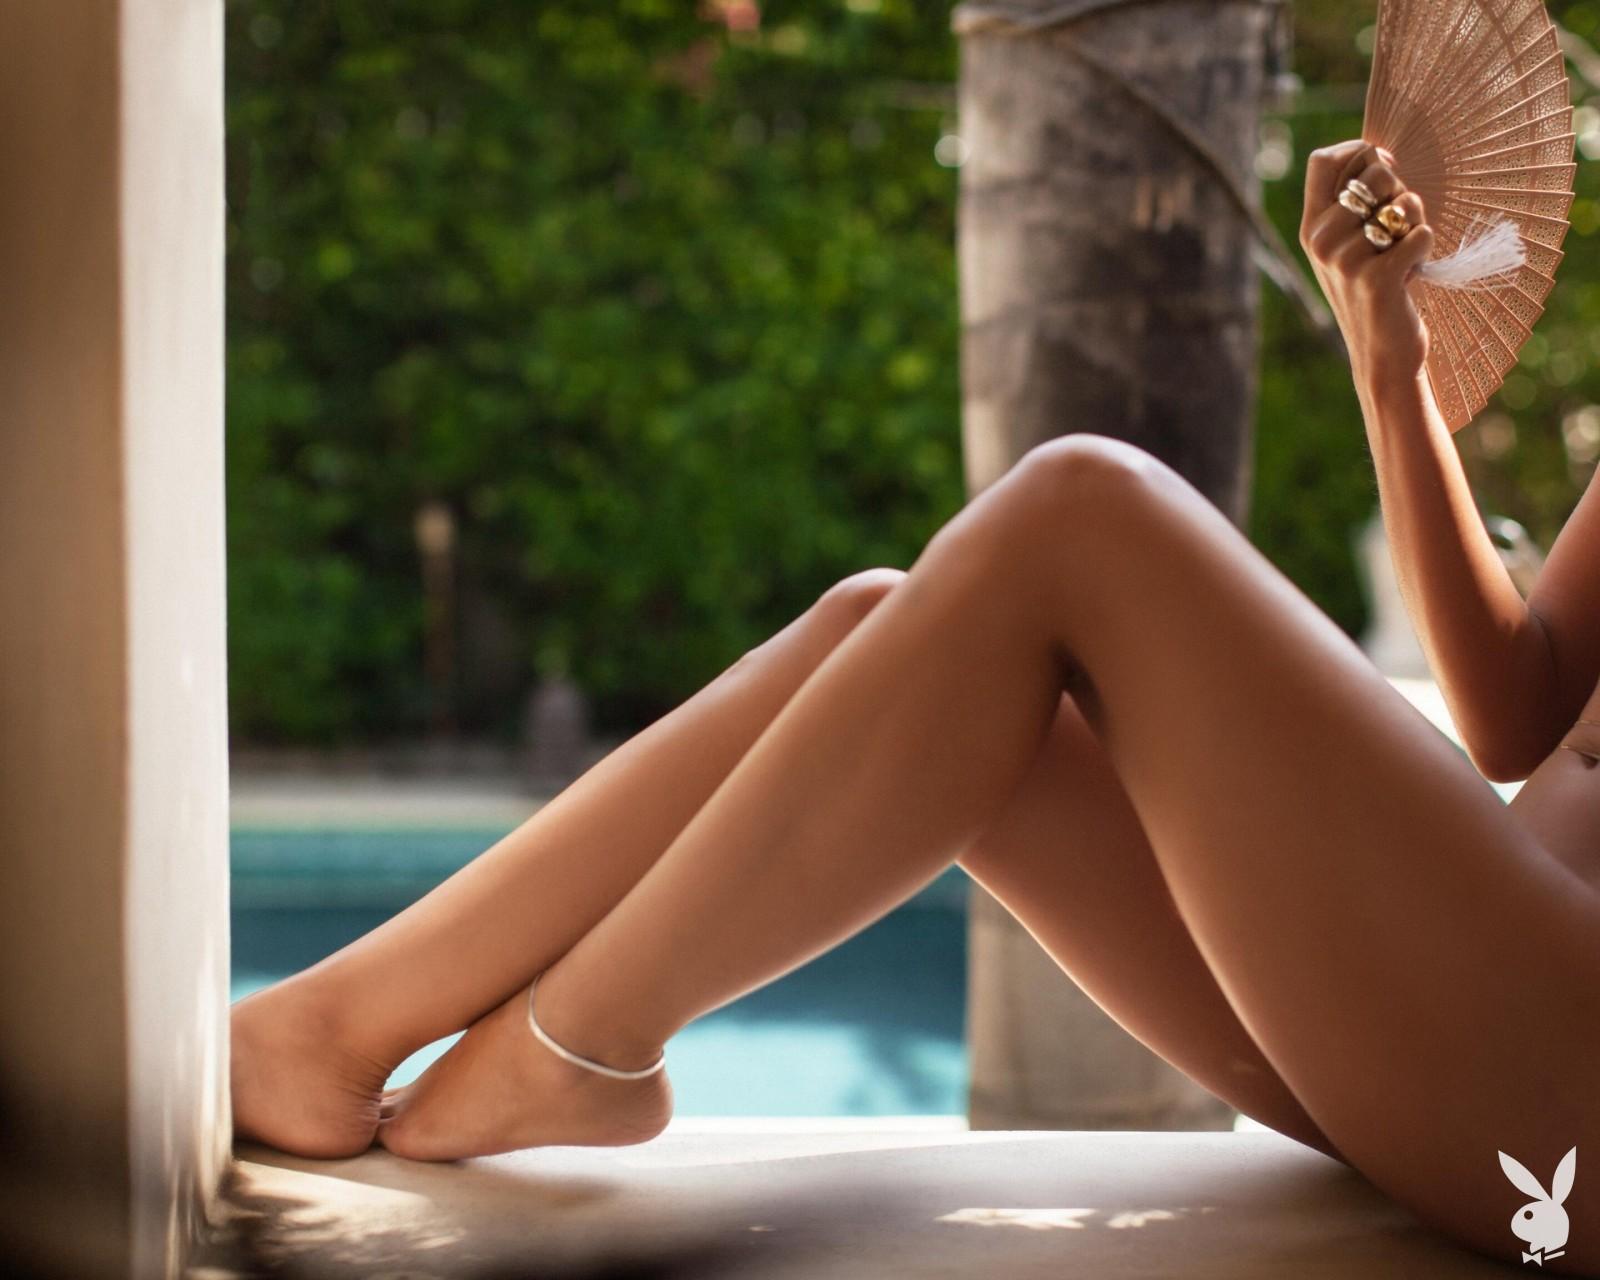 Playmate September 2020 Danielle Alcaraz Playboy Plus (21)